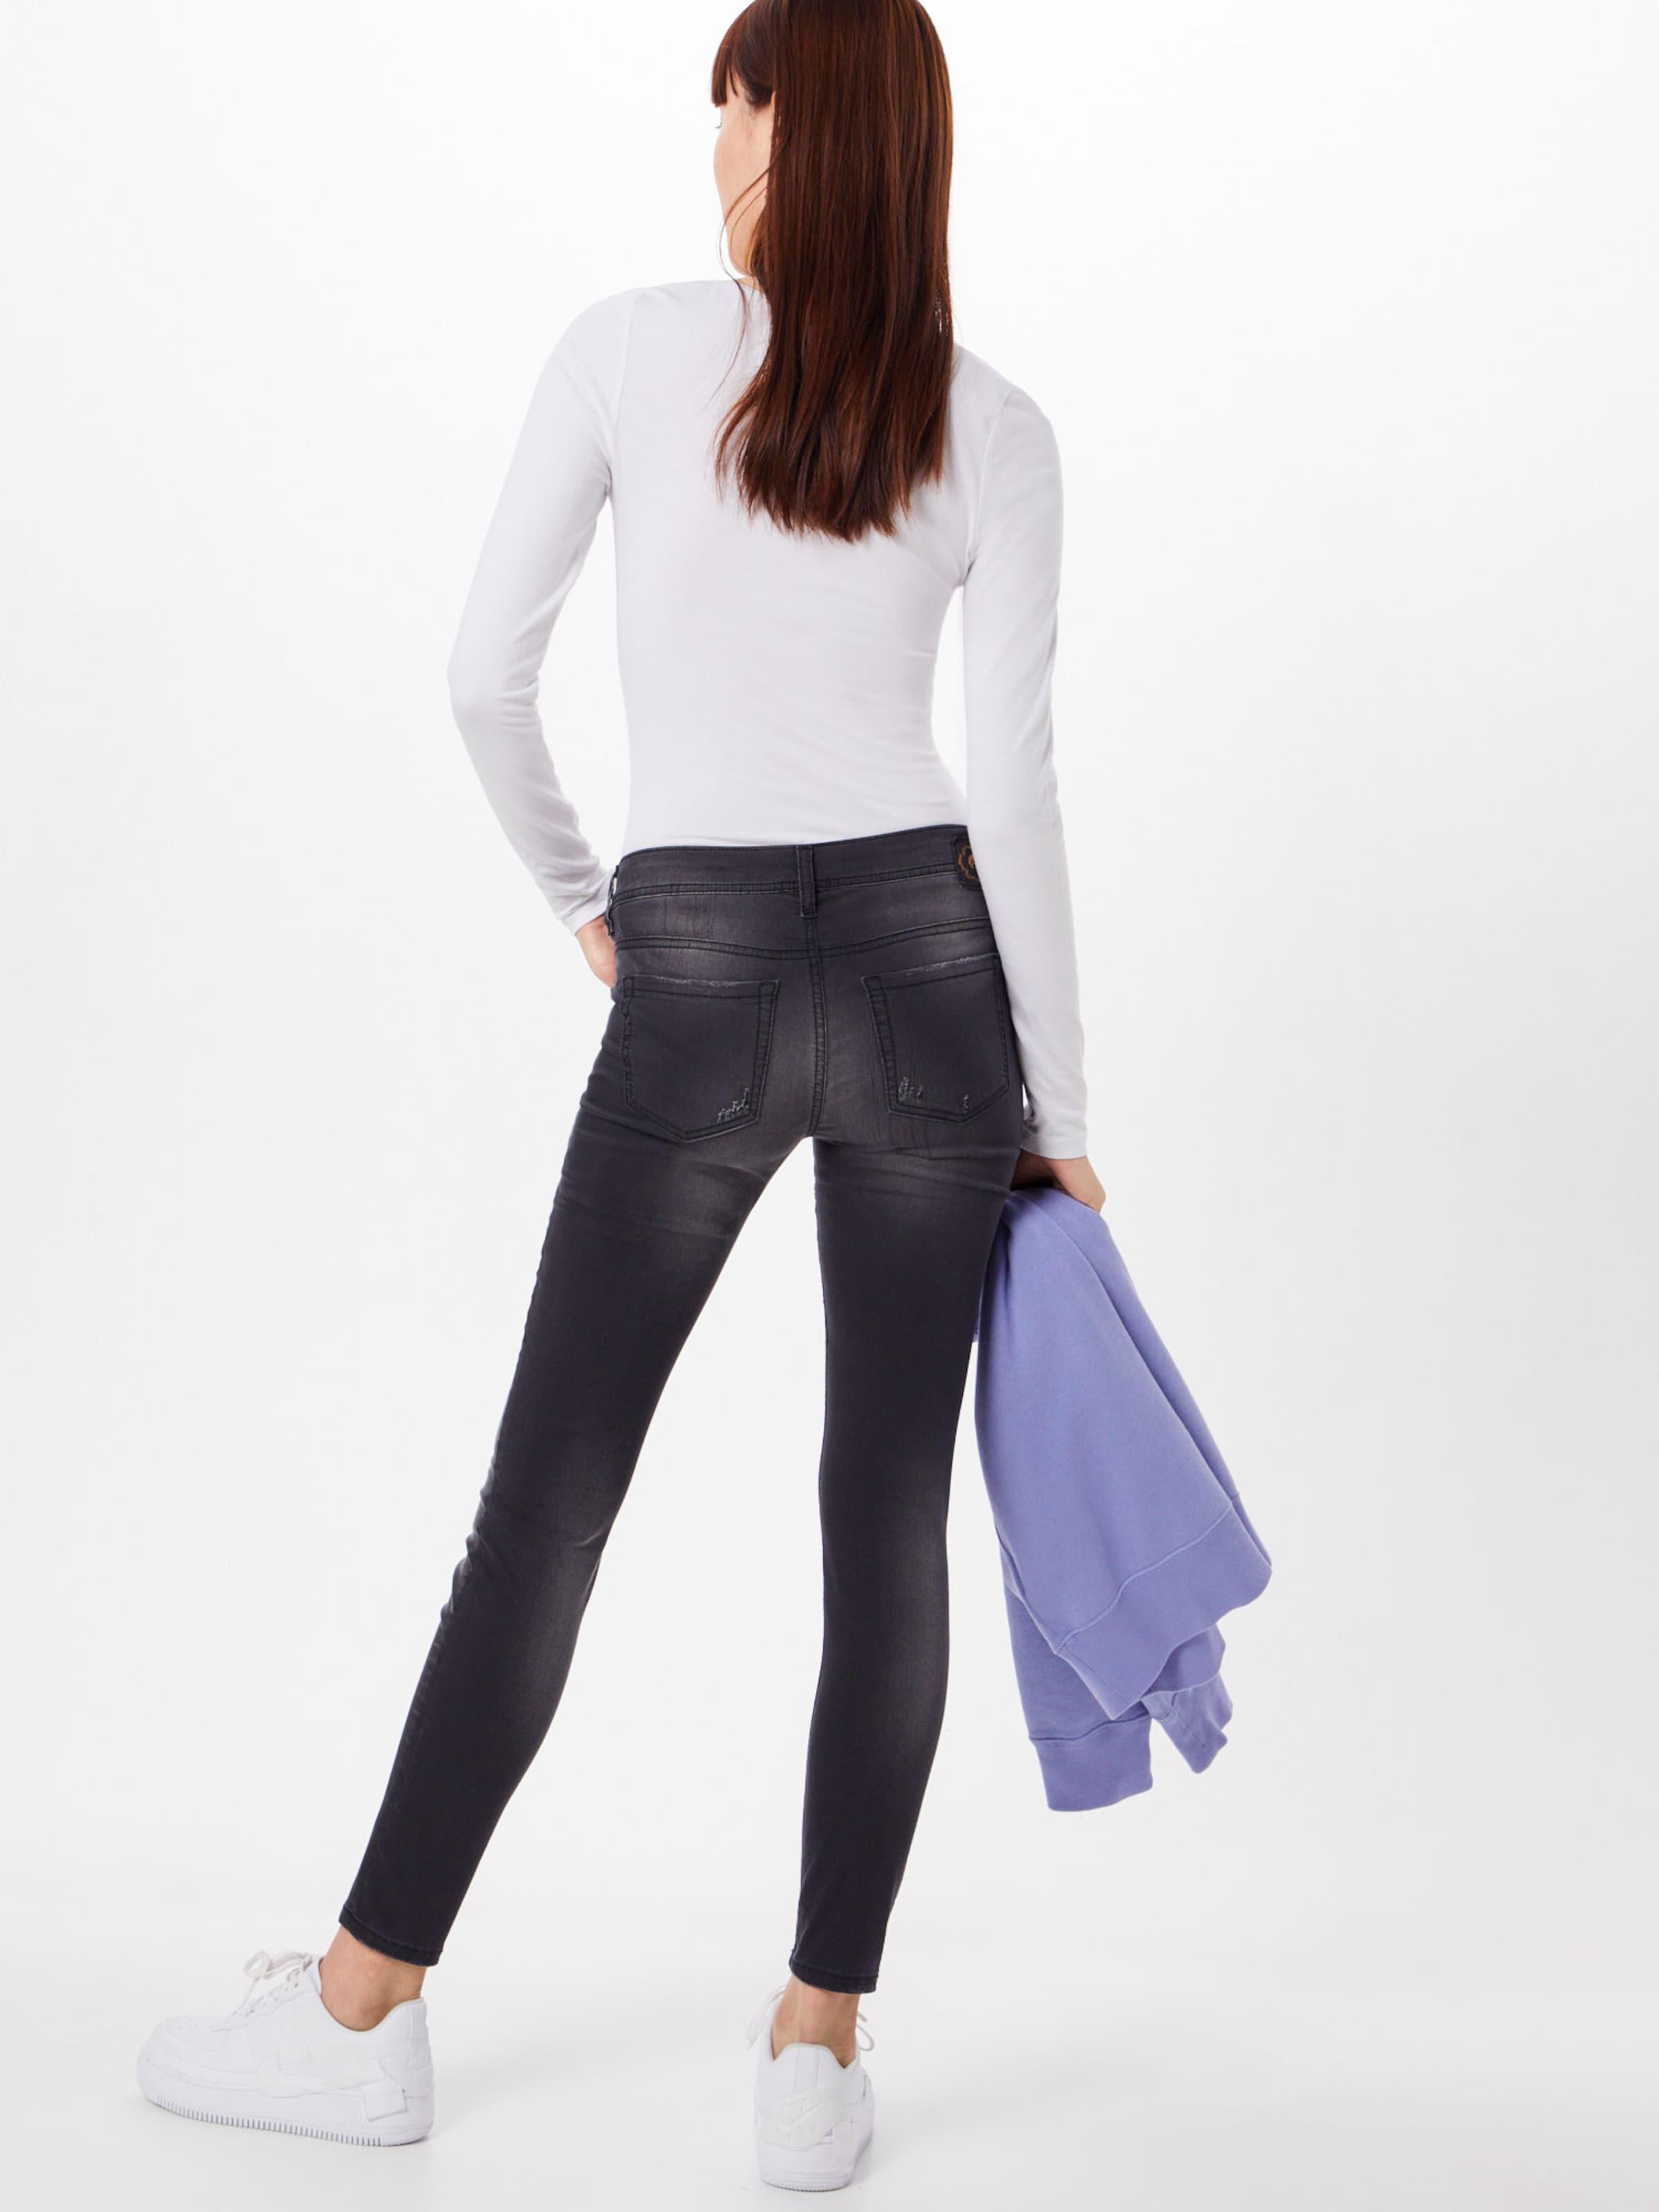 Gang Black Denim Jeans 'faye' In eIWEH2YD9